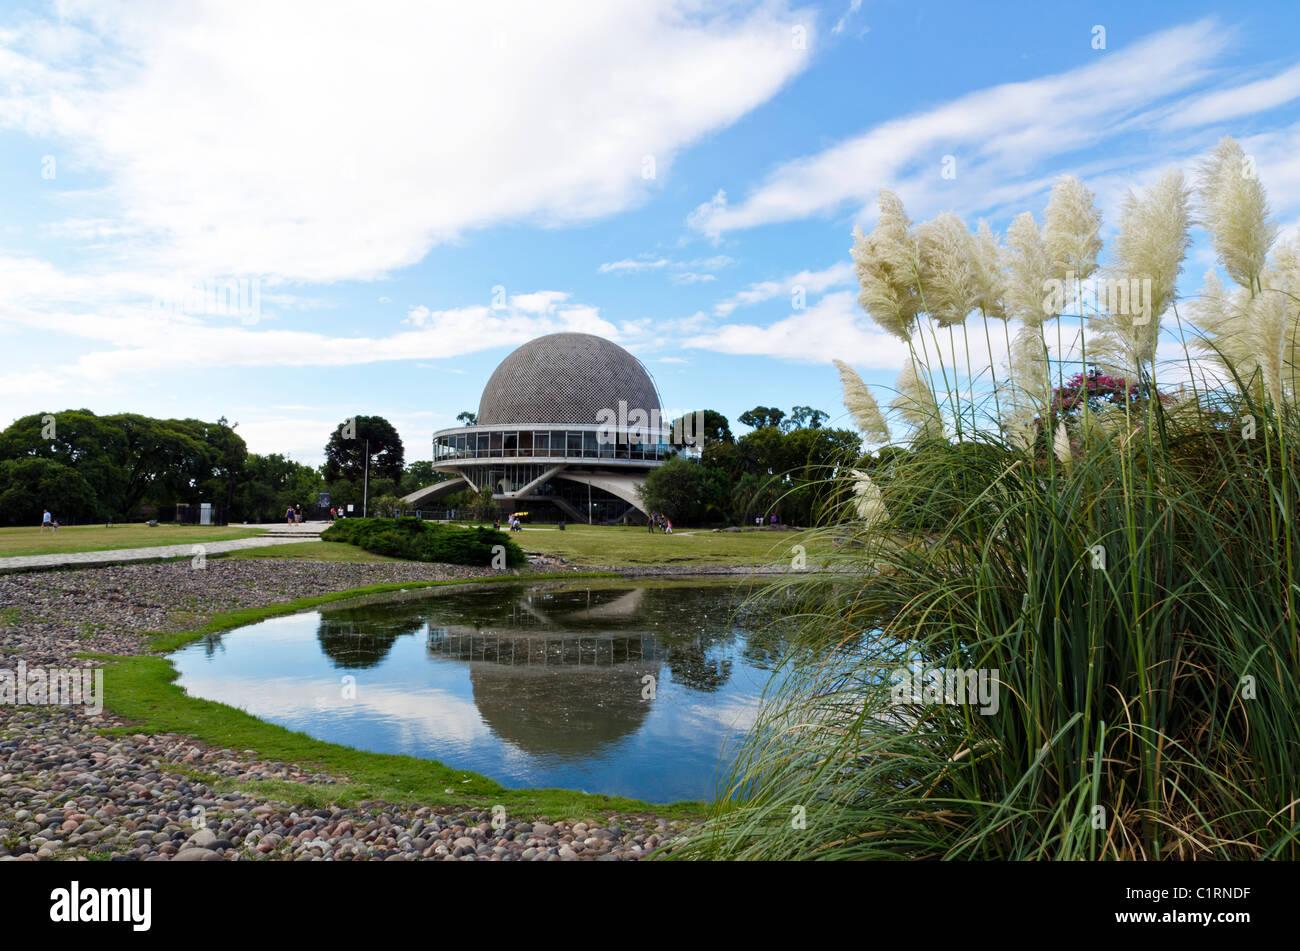 Planetarium Galileo Galilei in the neighborhood of Palermo, Buenos Aires, Argentina - Stock Image